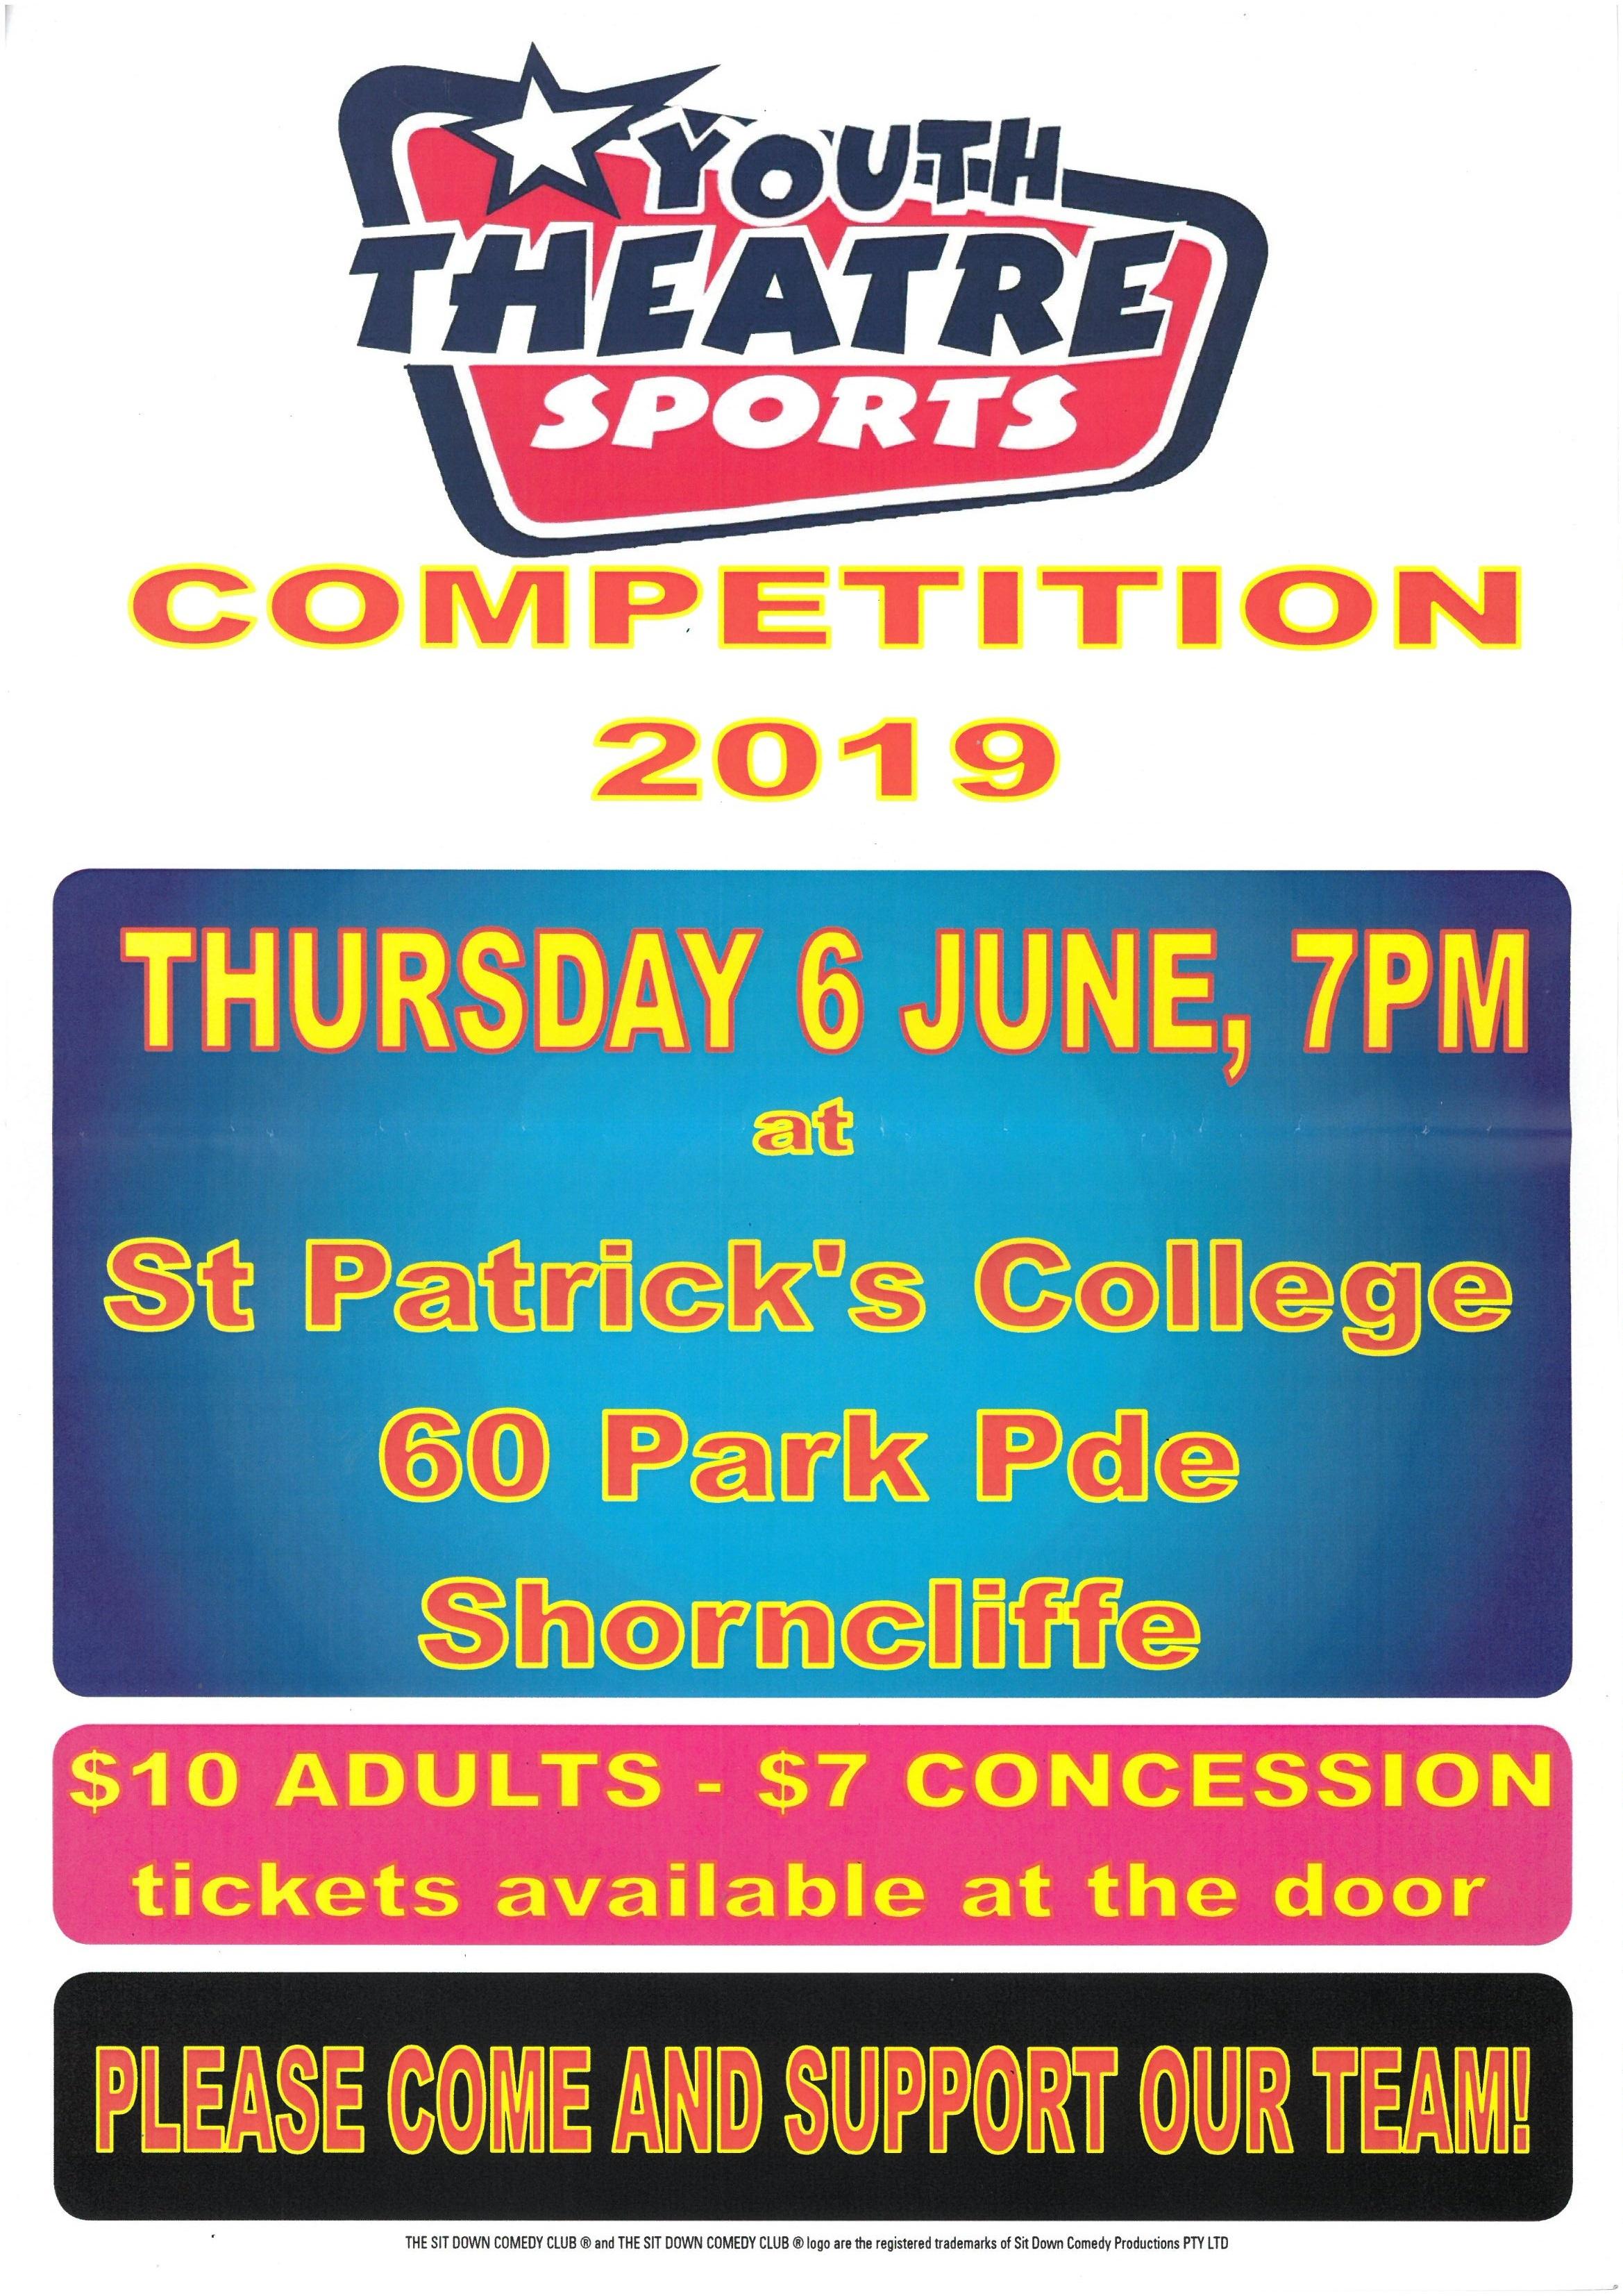 Theatresports-Competition-6.6.19.jpg?mti